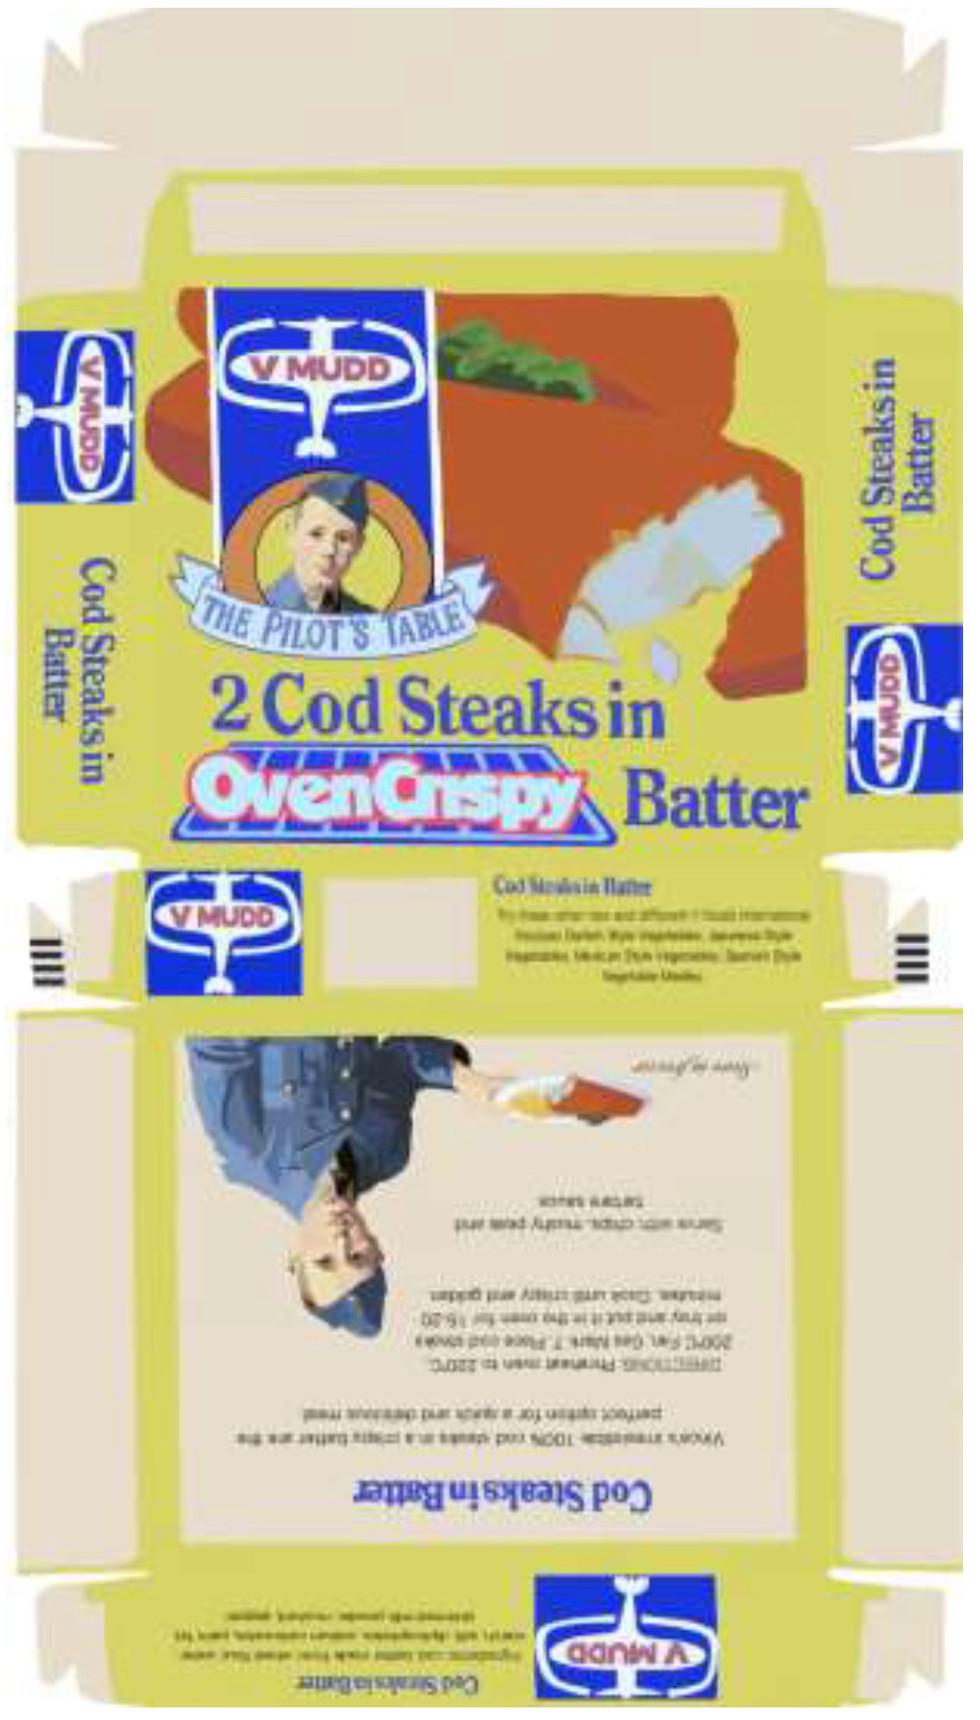 V. Mudd Cod Steaks